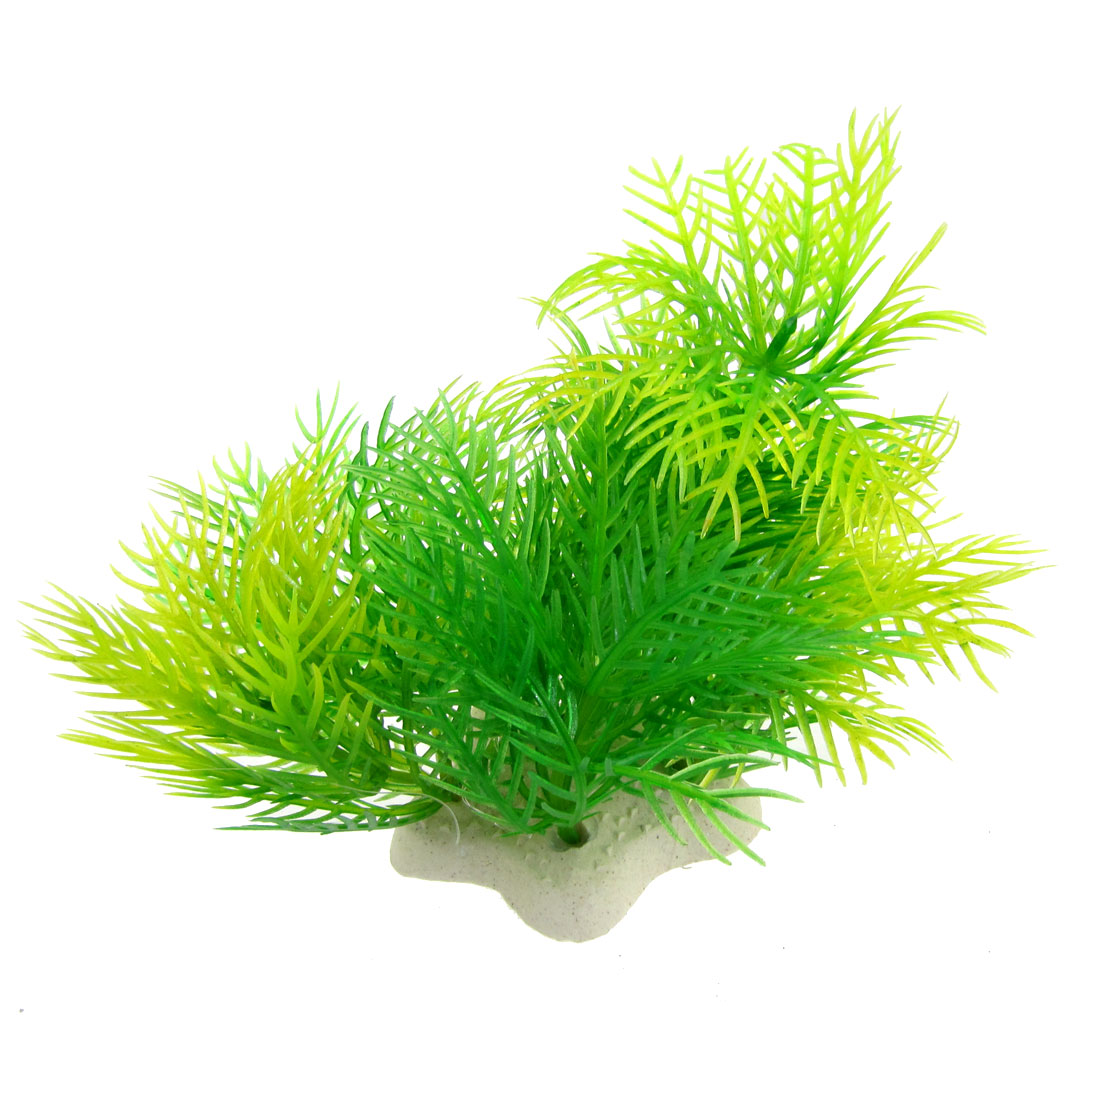 "Aquarium Fish Tank Yellow Green Leaves 3.5"" High Simulated Plastic Plant Decor"